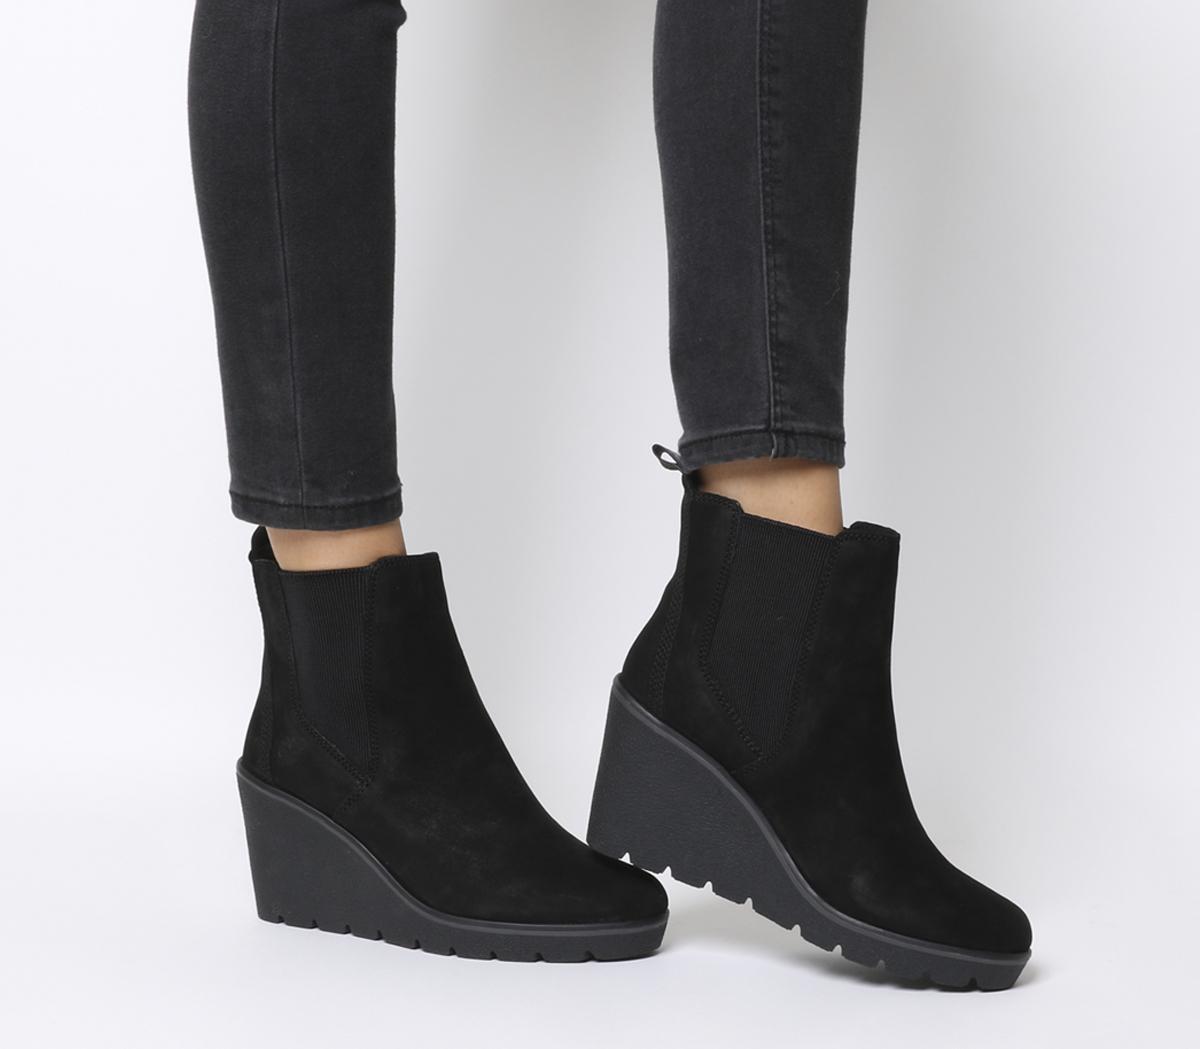 Paris Height Chelsea Boots